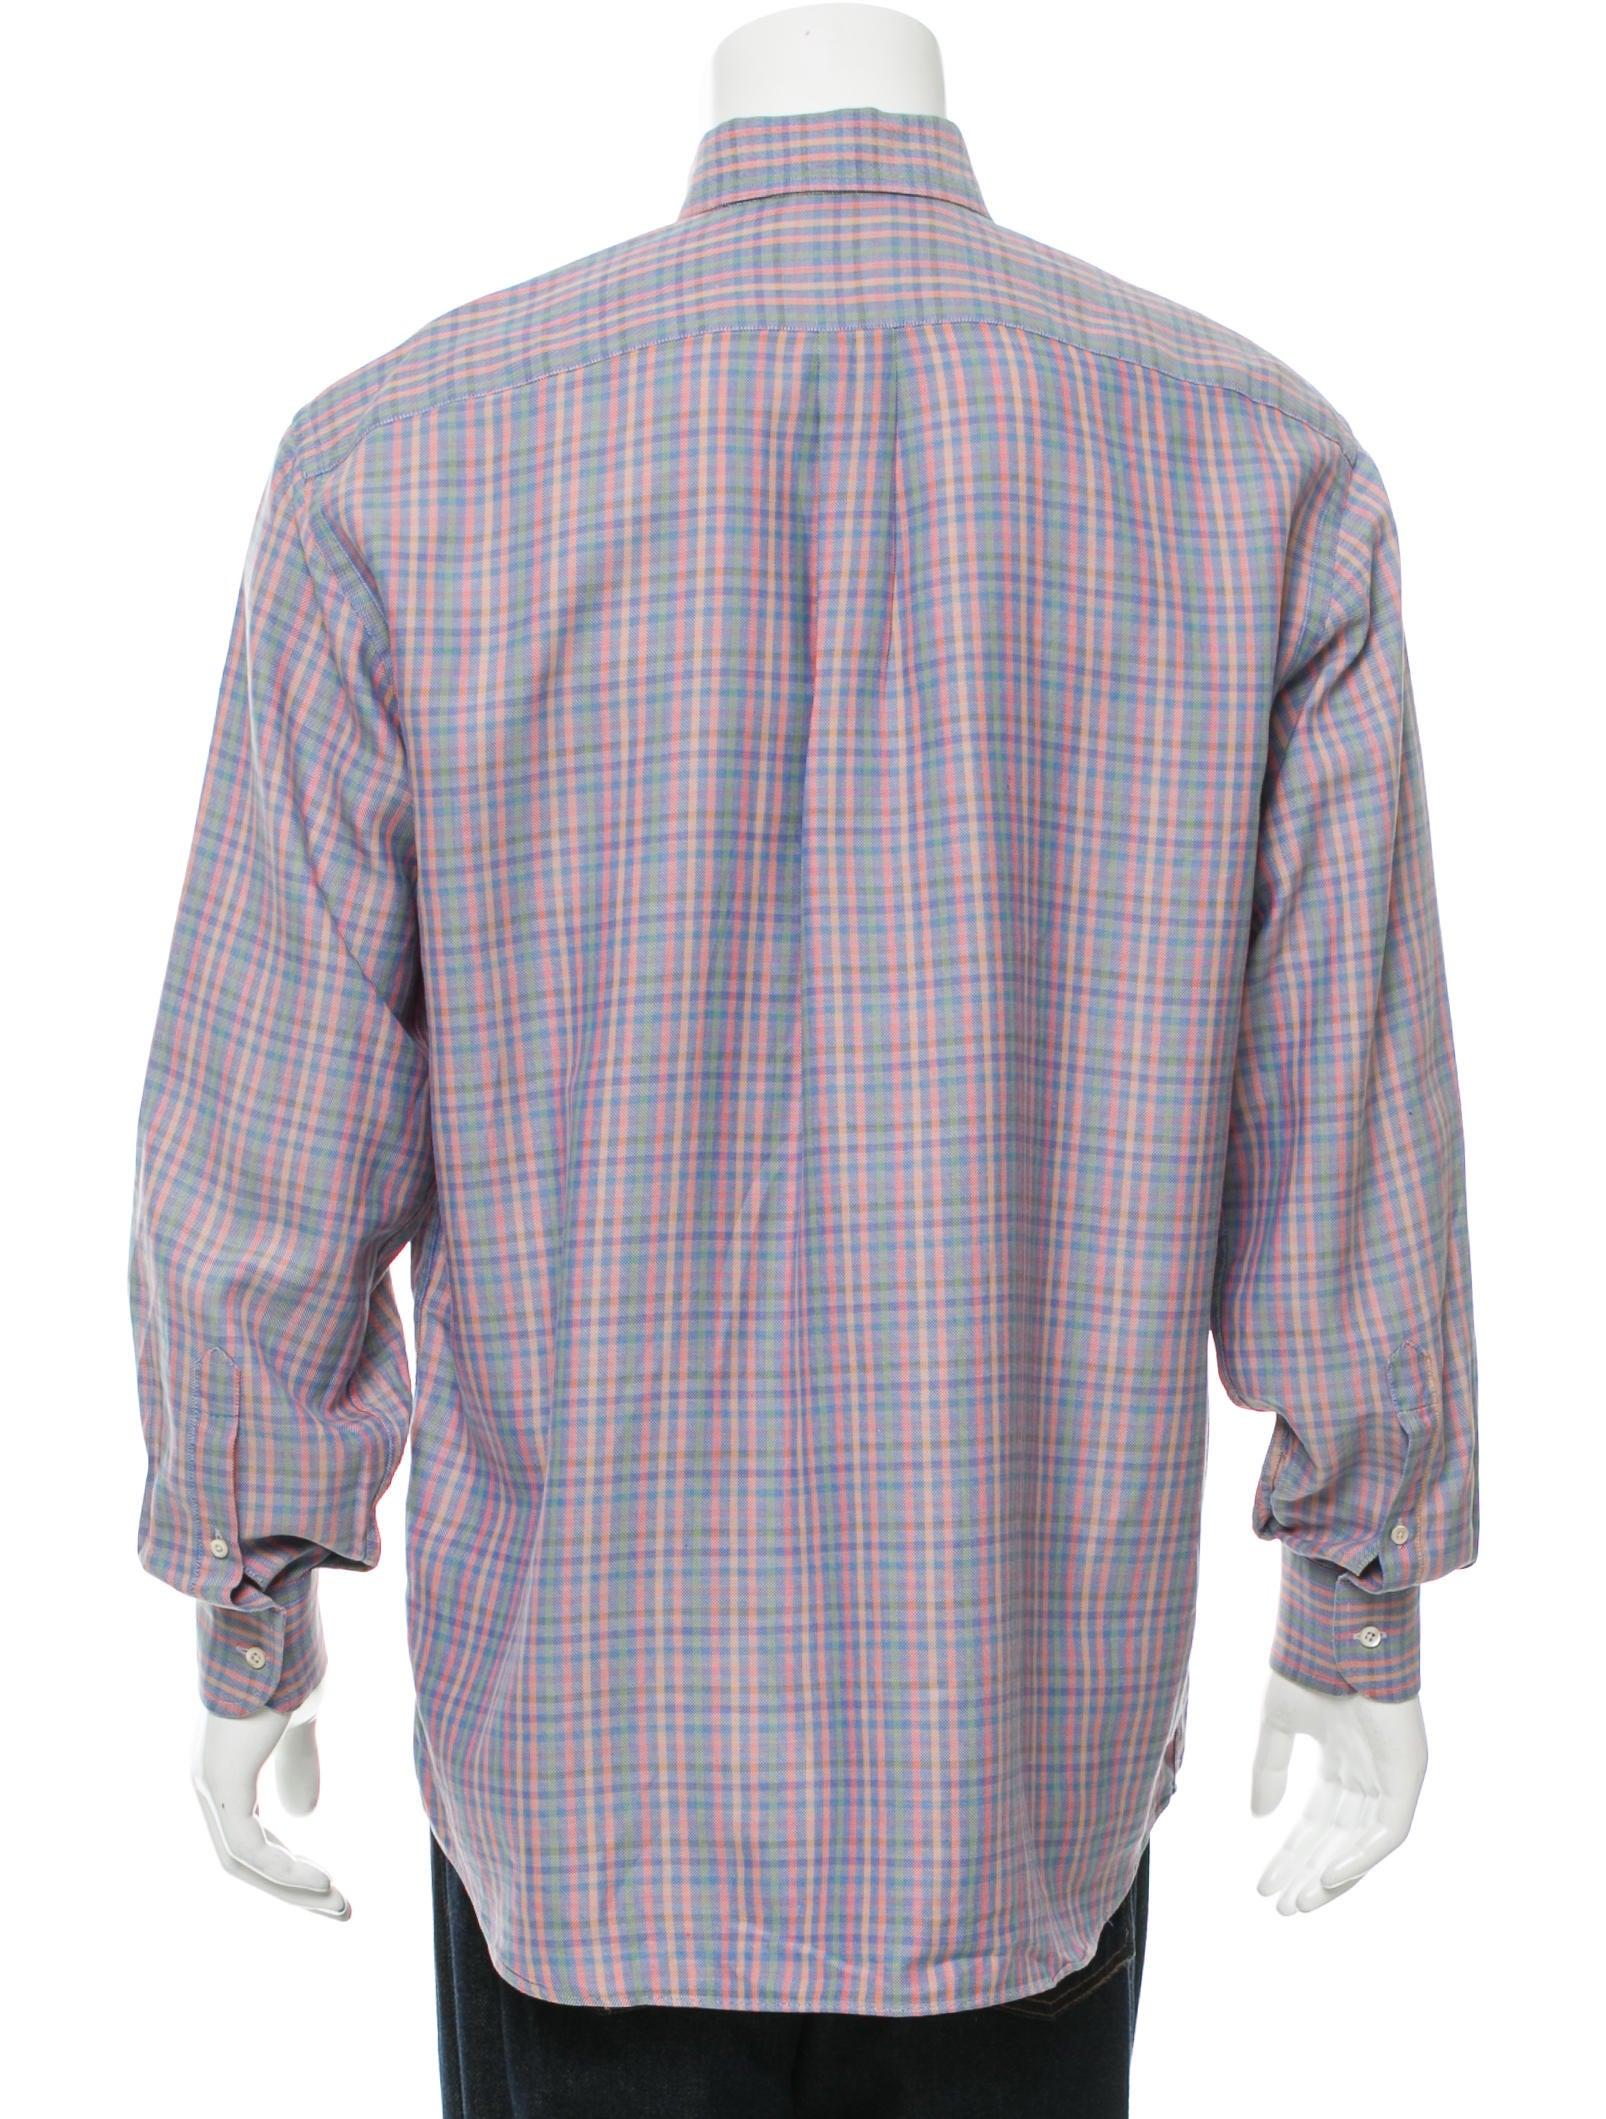 Burberry London Plaid Button Up Shirt Clothing